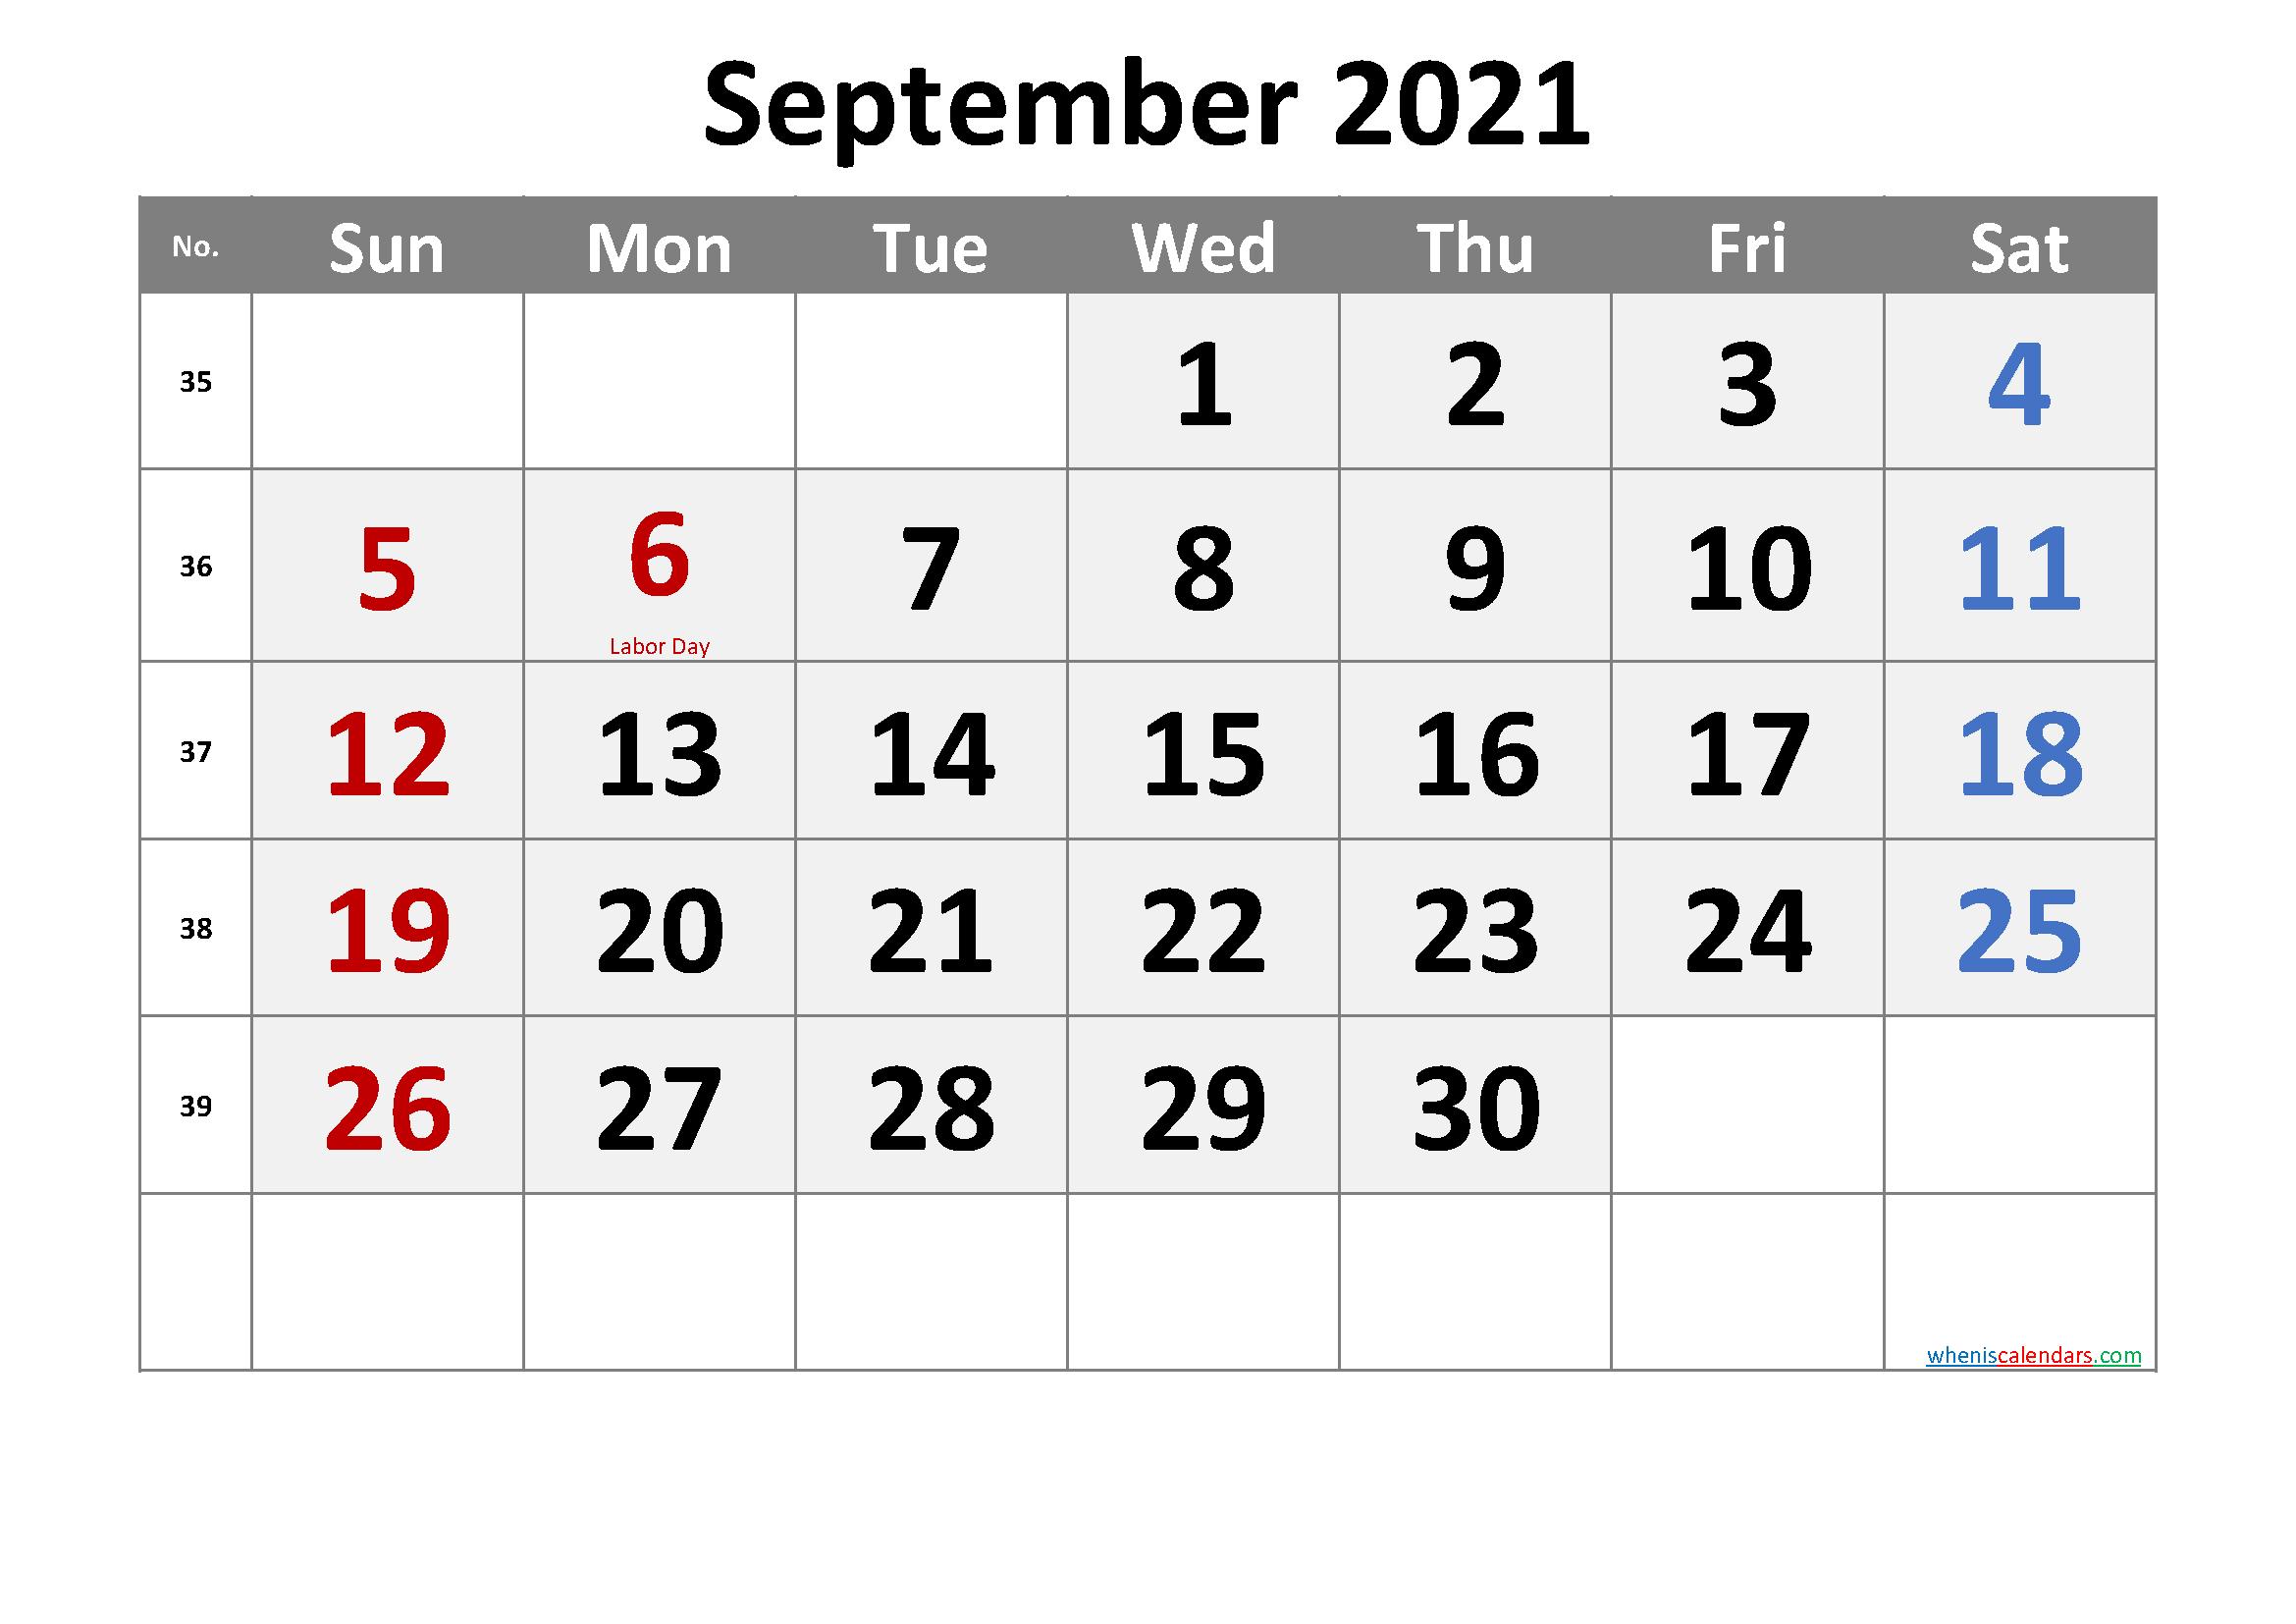 SEPTEMBER 2021 Printable Calendar with Holidays